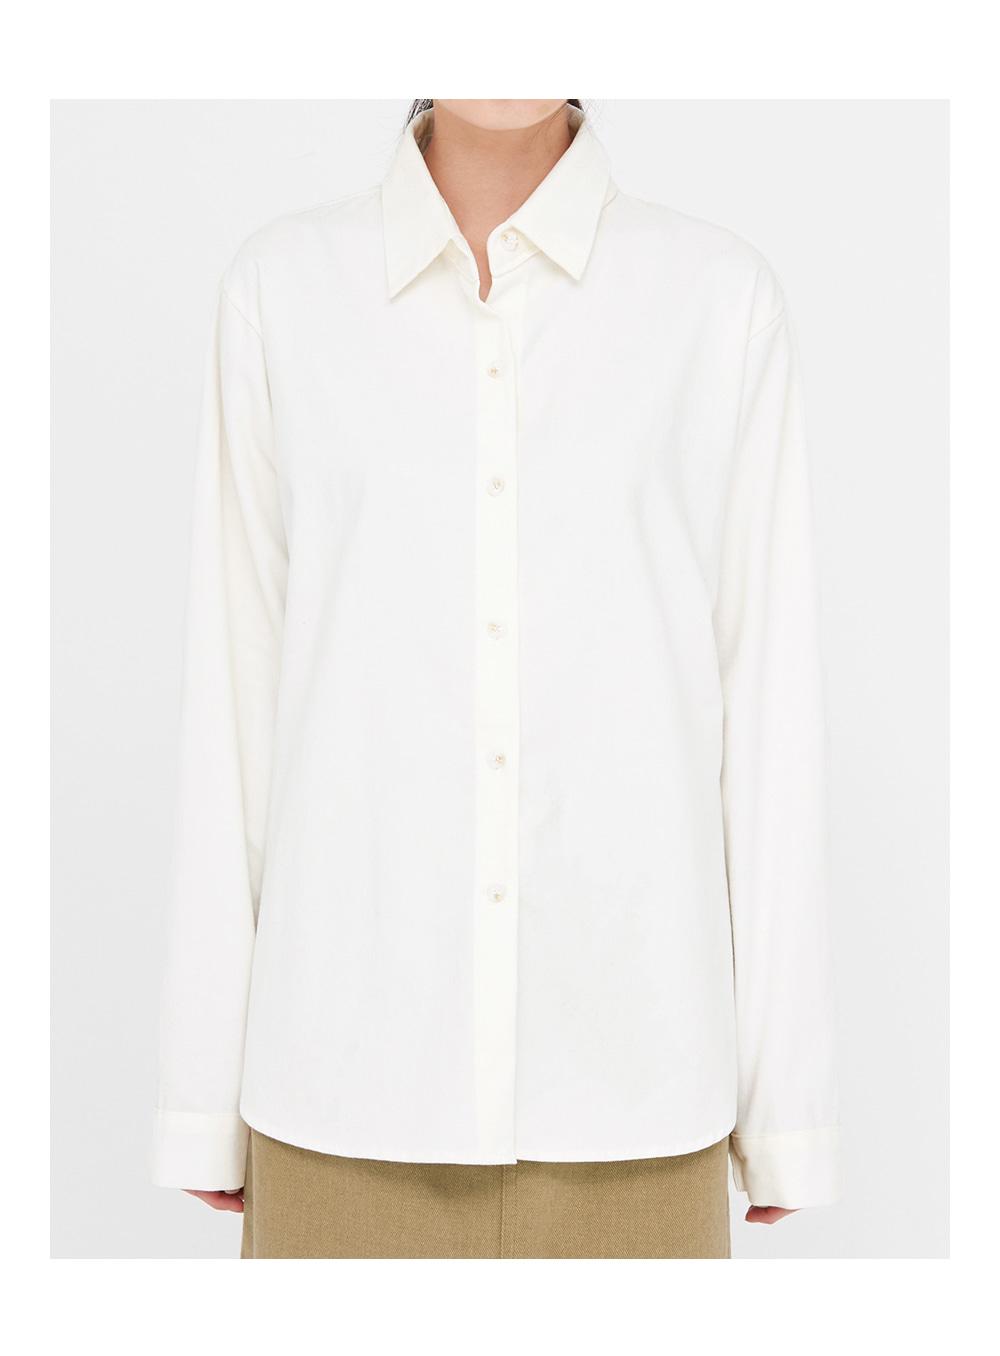 dazy cotton napping shirts